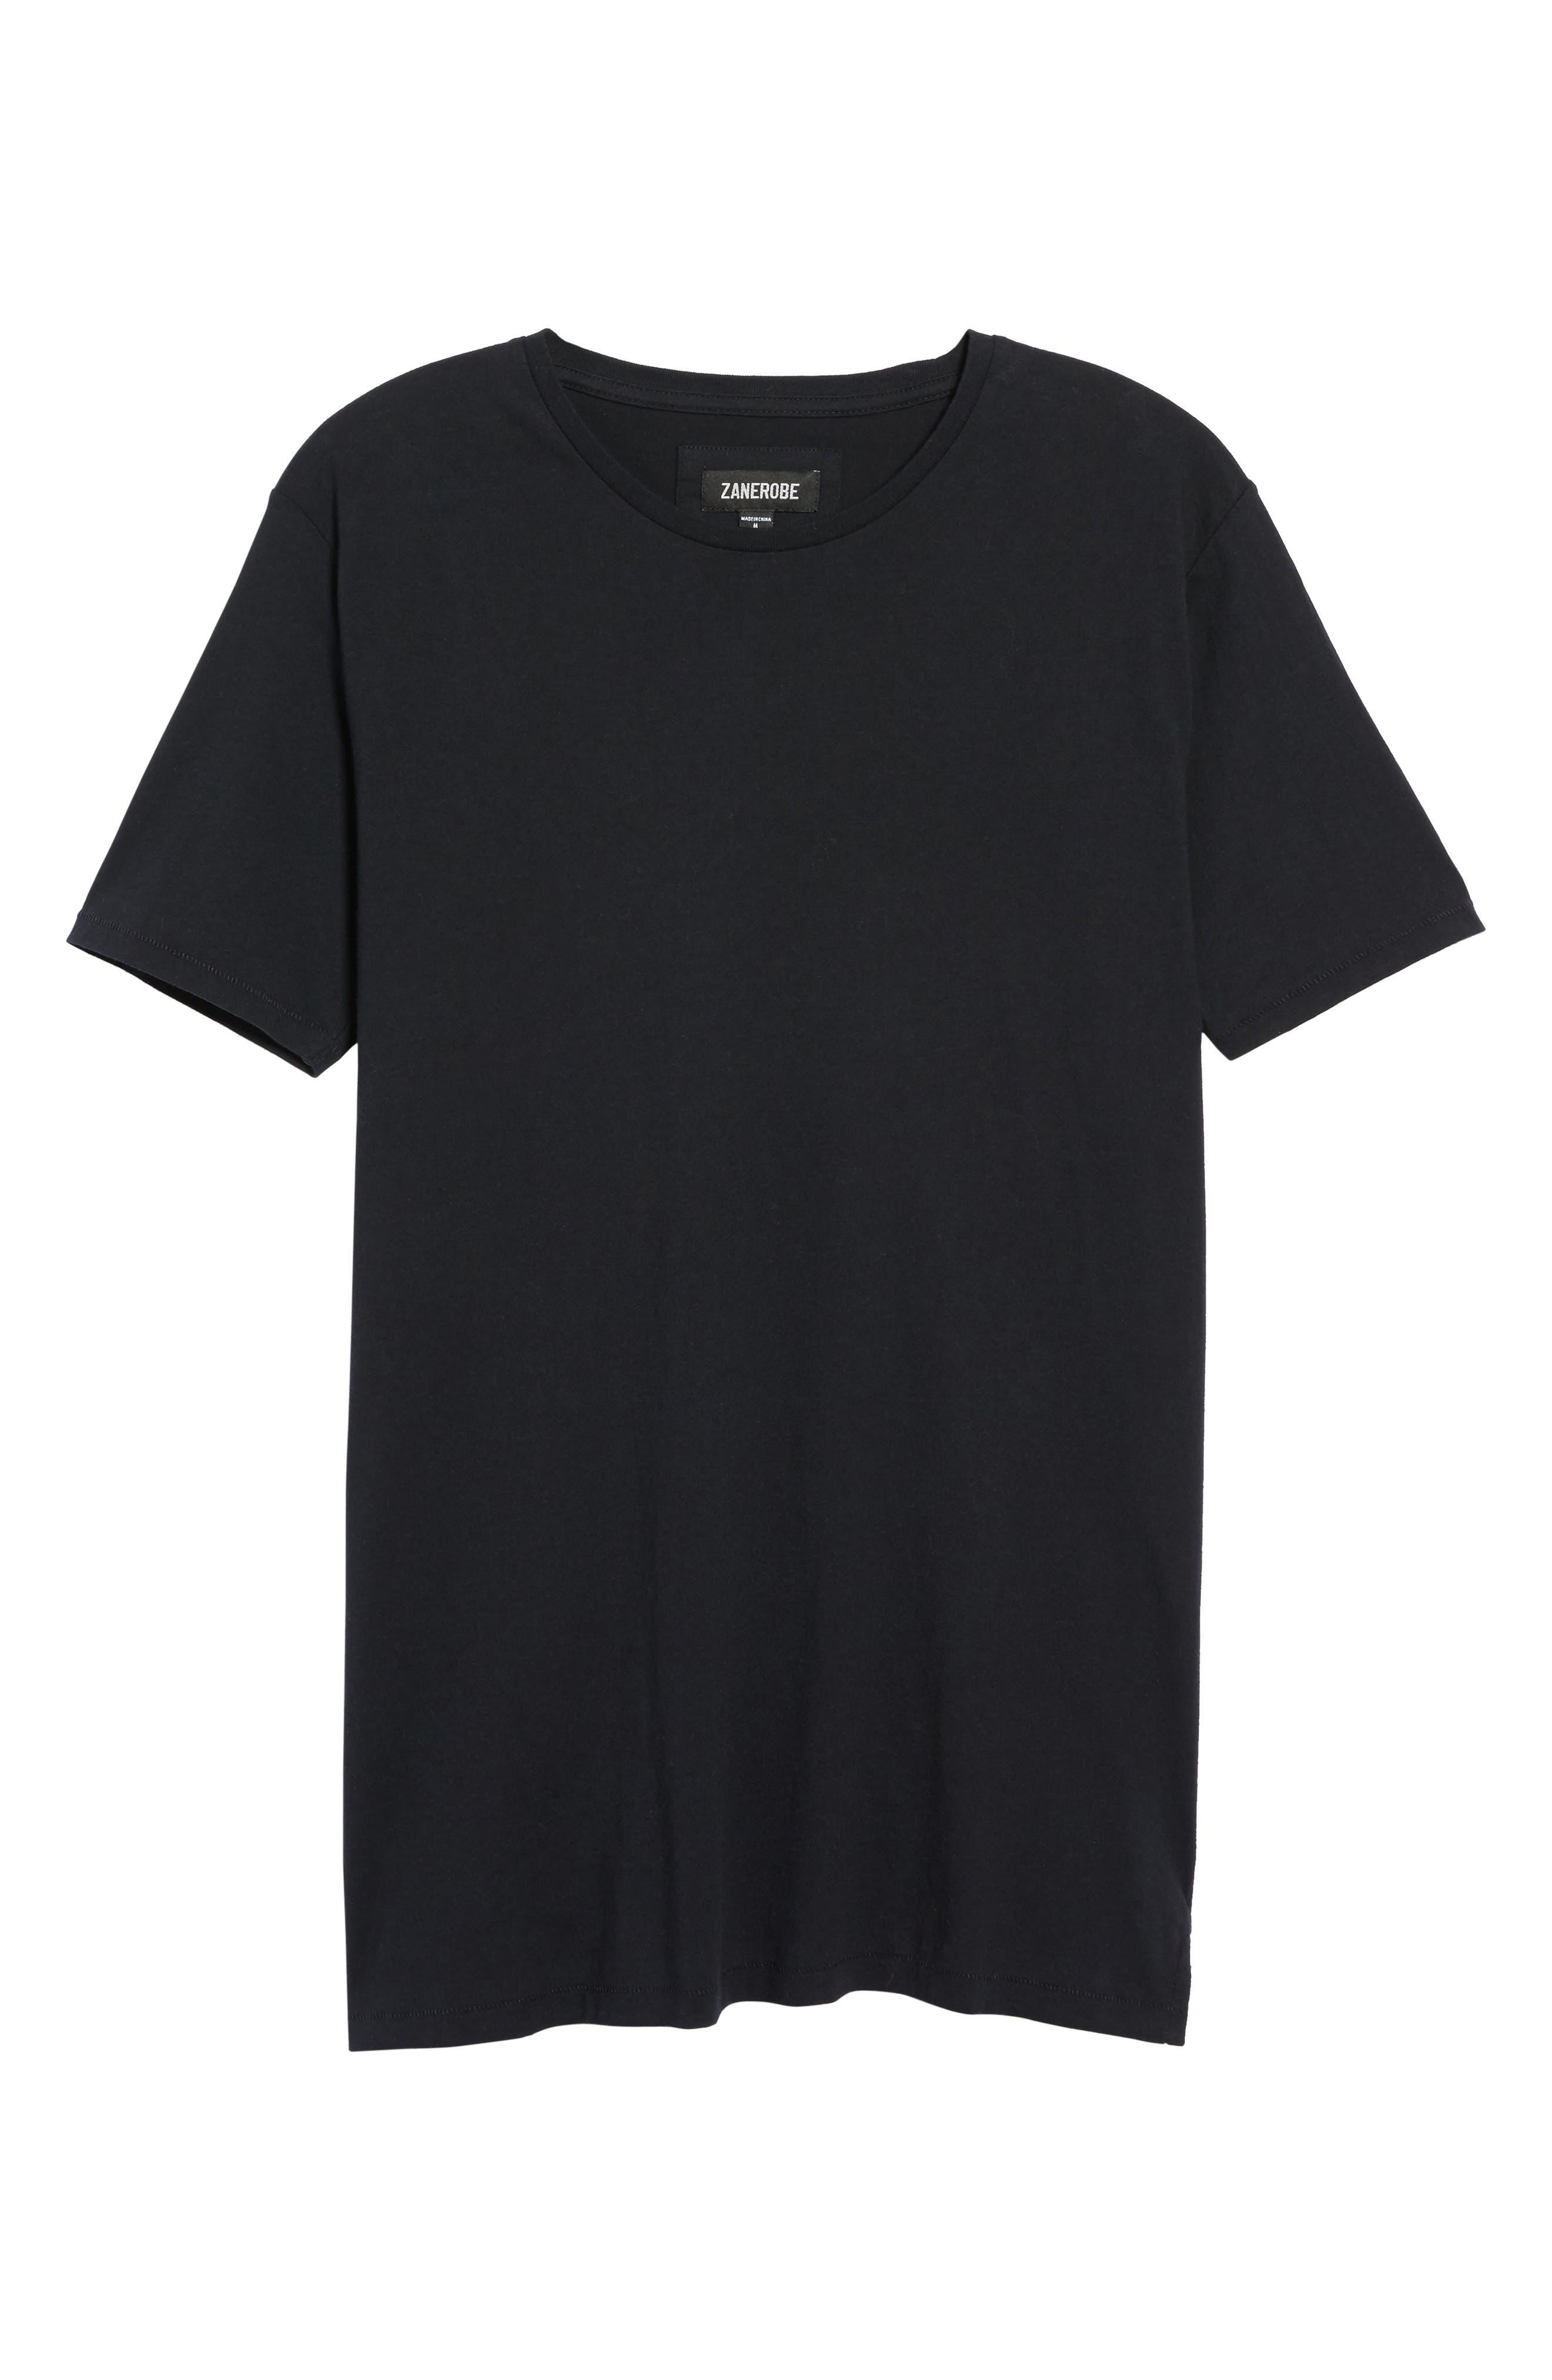 Flintlock Longline T-Shirt,                             Main thumbnail 1, color,                             001